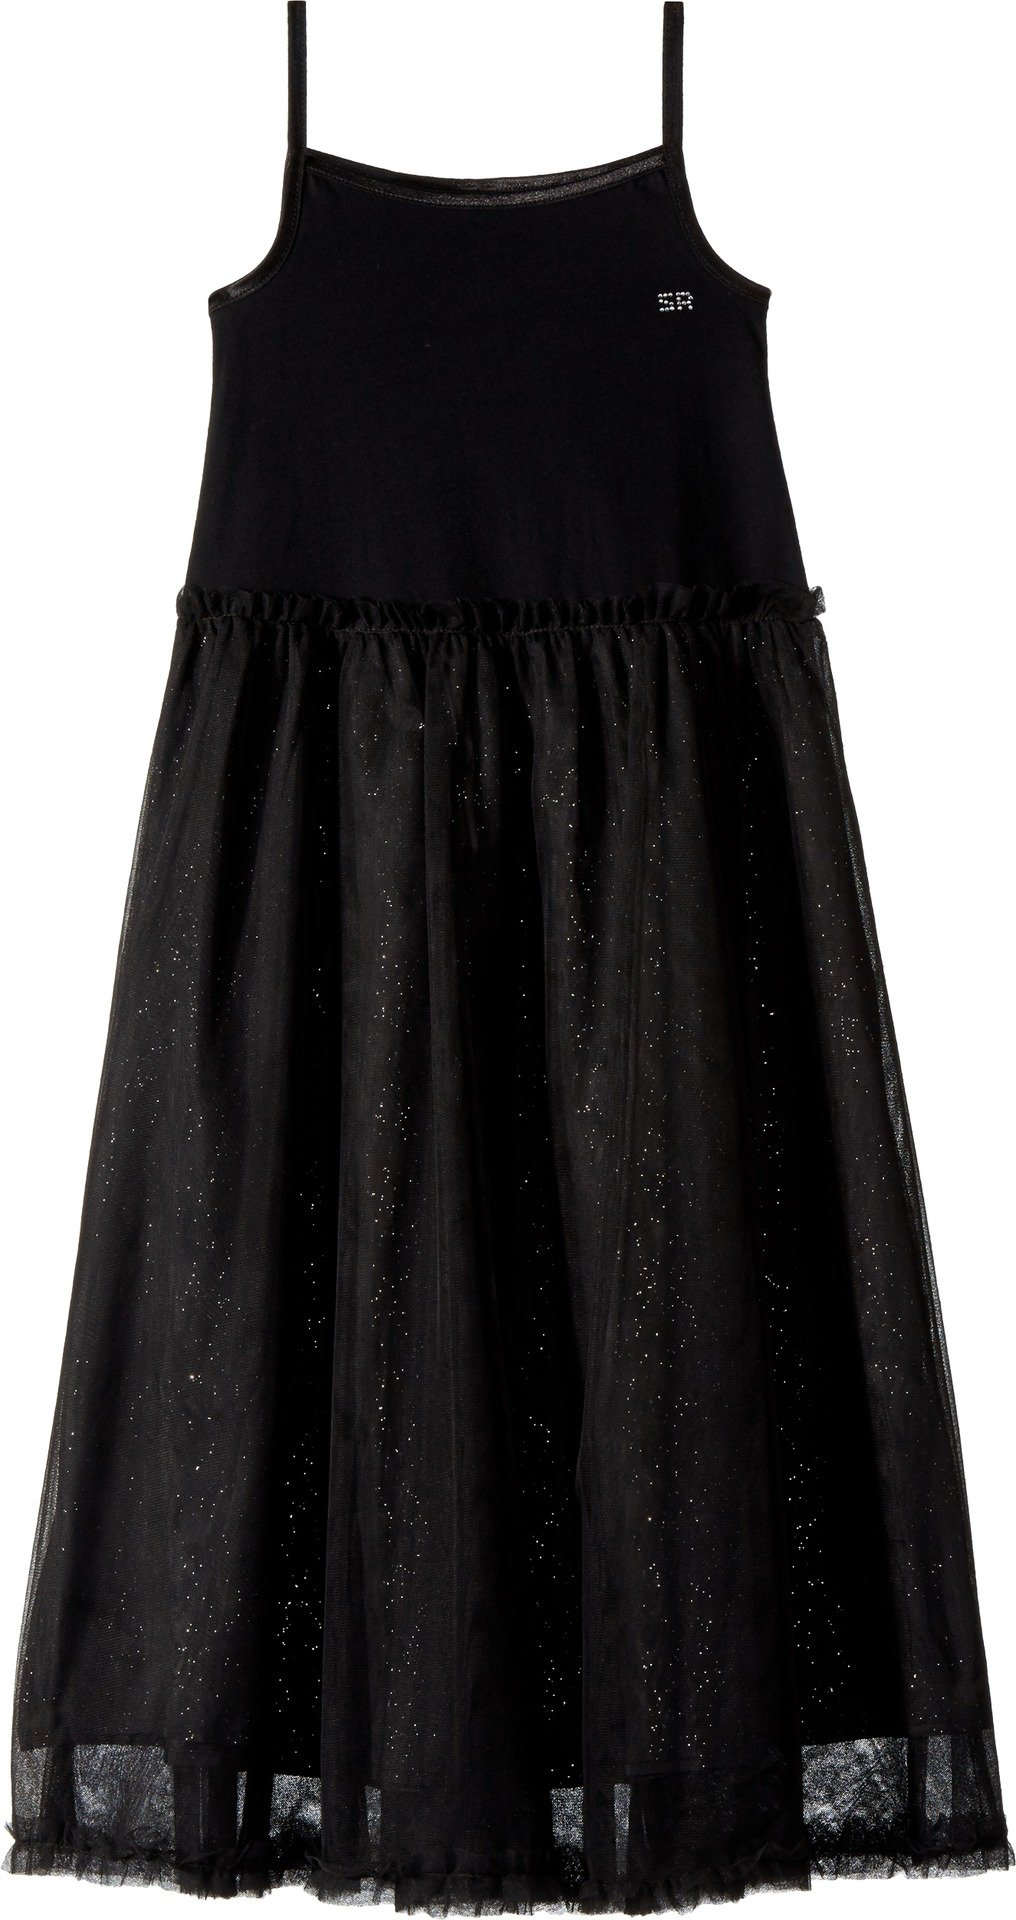 Sonia Rykiel Kids Girl's Agnes Maxi Dress w/Tulle Skirt (Little Kids/Big Kids) Black 14 Years